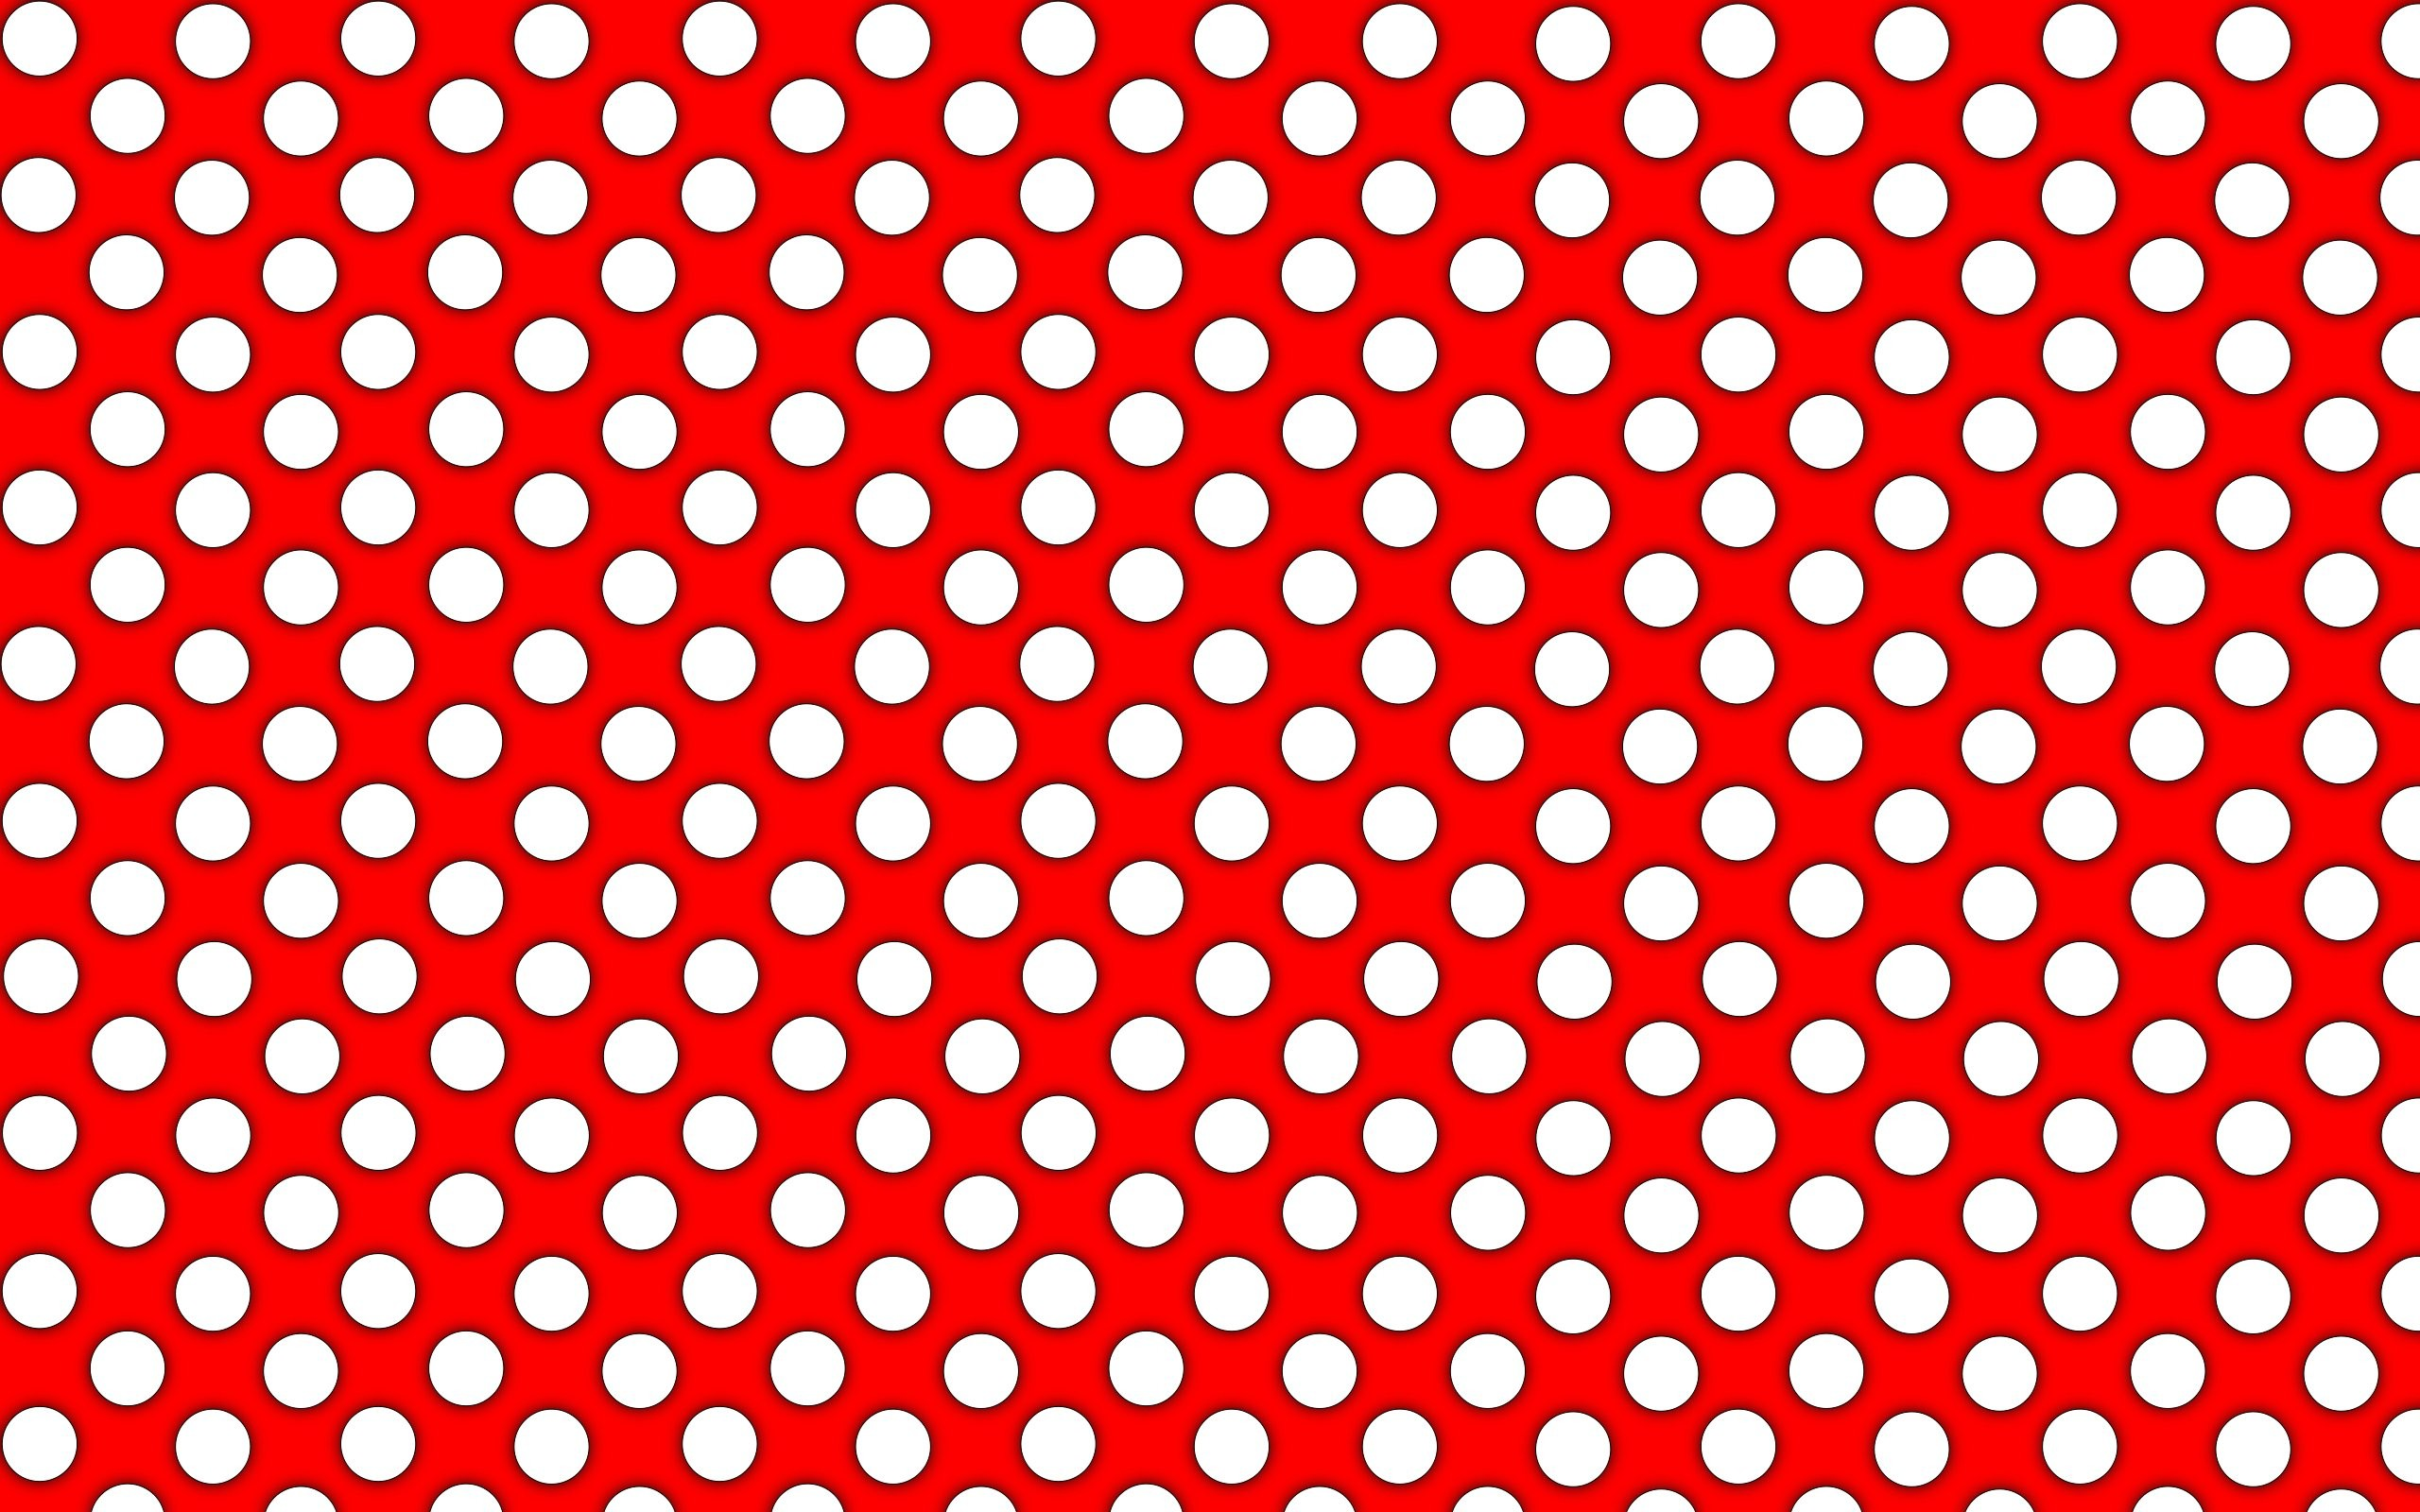 Hd Wallpaper Polka Dot Card Stock: Wallpapers for Gt Red Polka Dots .